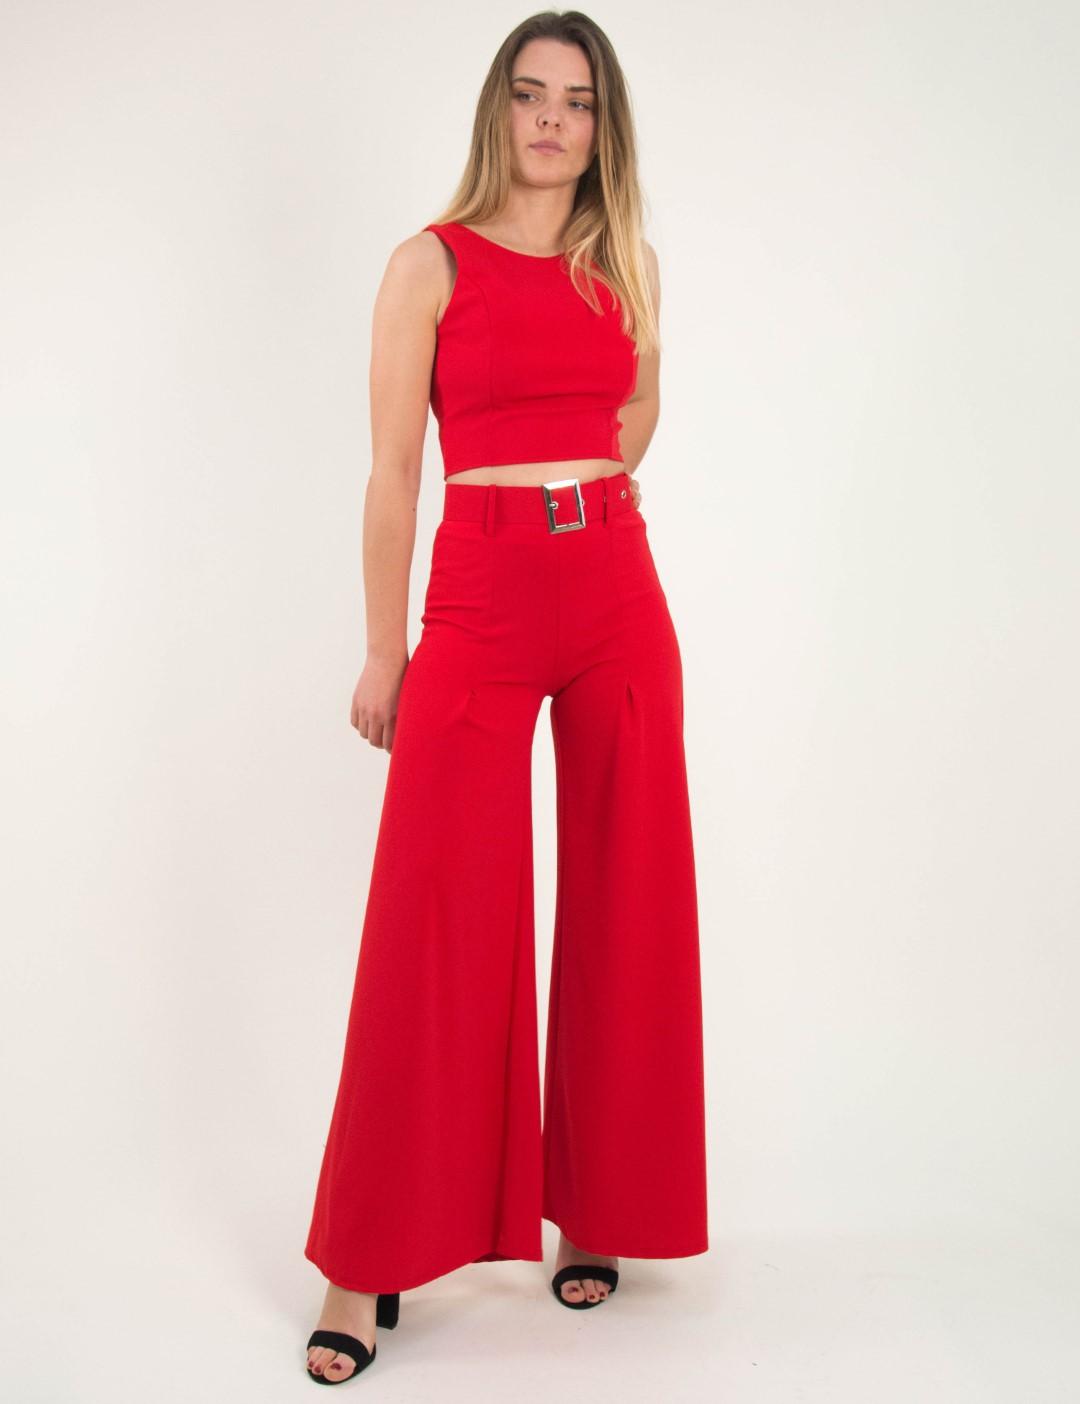 b9165e9a87f0 Γυναικείο κόκκινο σετ παντελόνα καμπάνα ζώνη τοπ 250079D